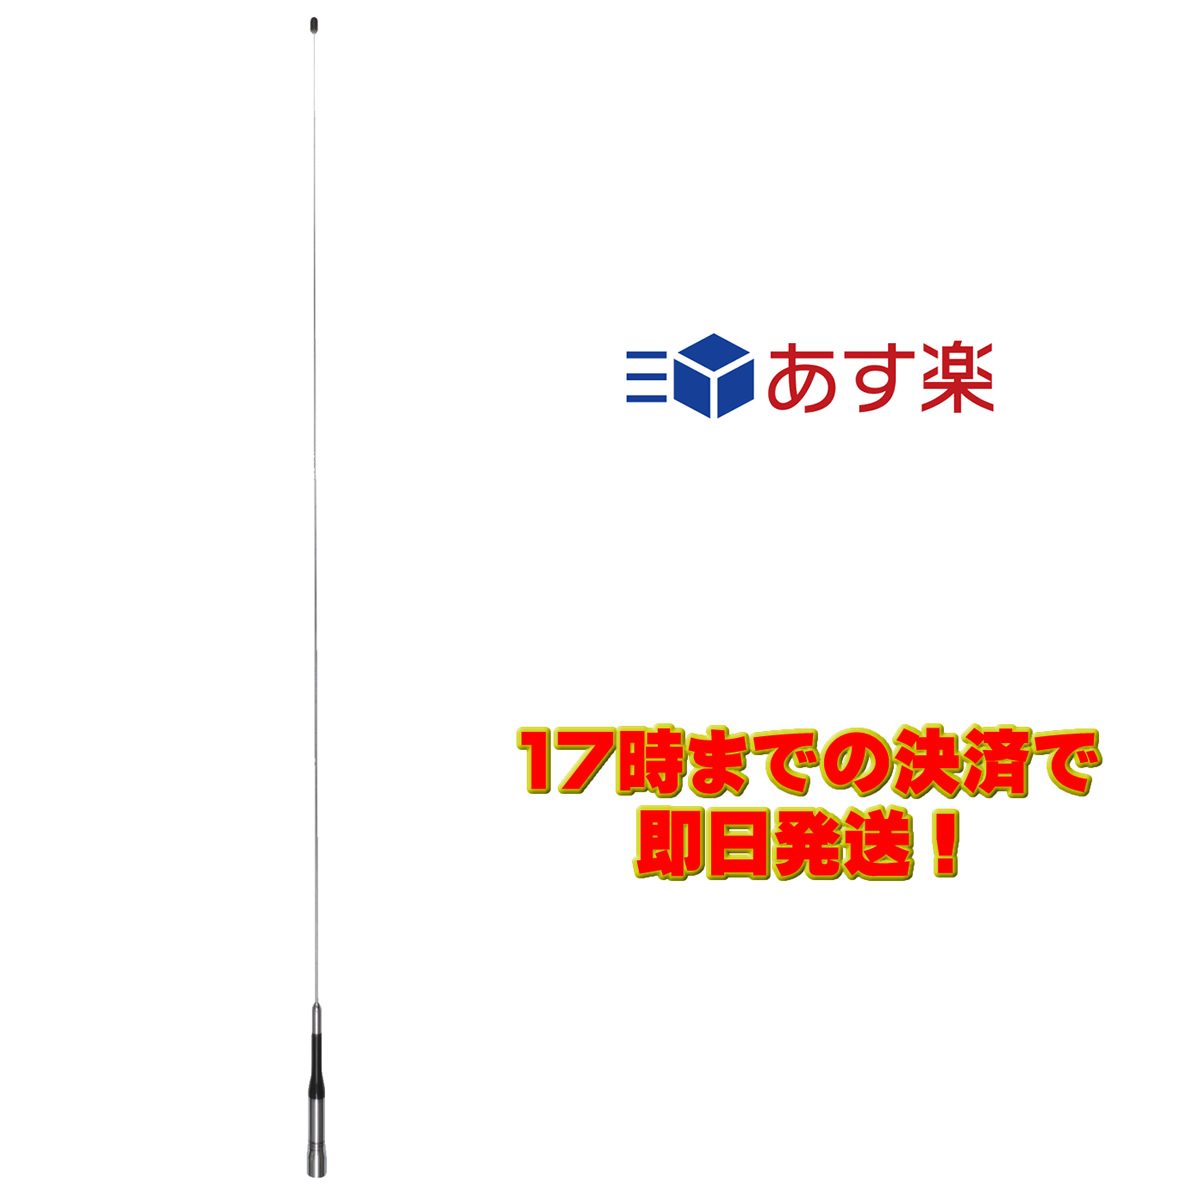 AZ140 ダイヤモンド 140MHz帯デジタル小電力コミュニティ無線用モービルアンテナOwPn08kX